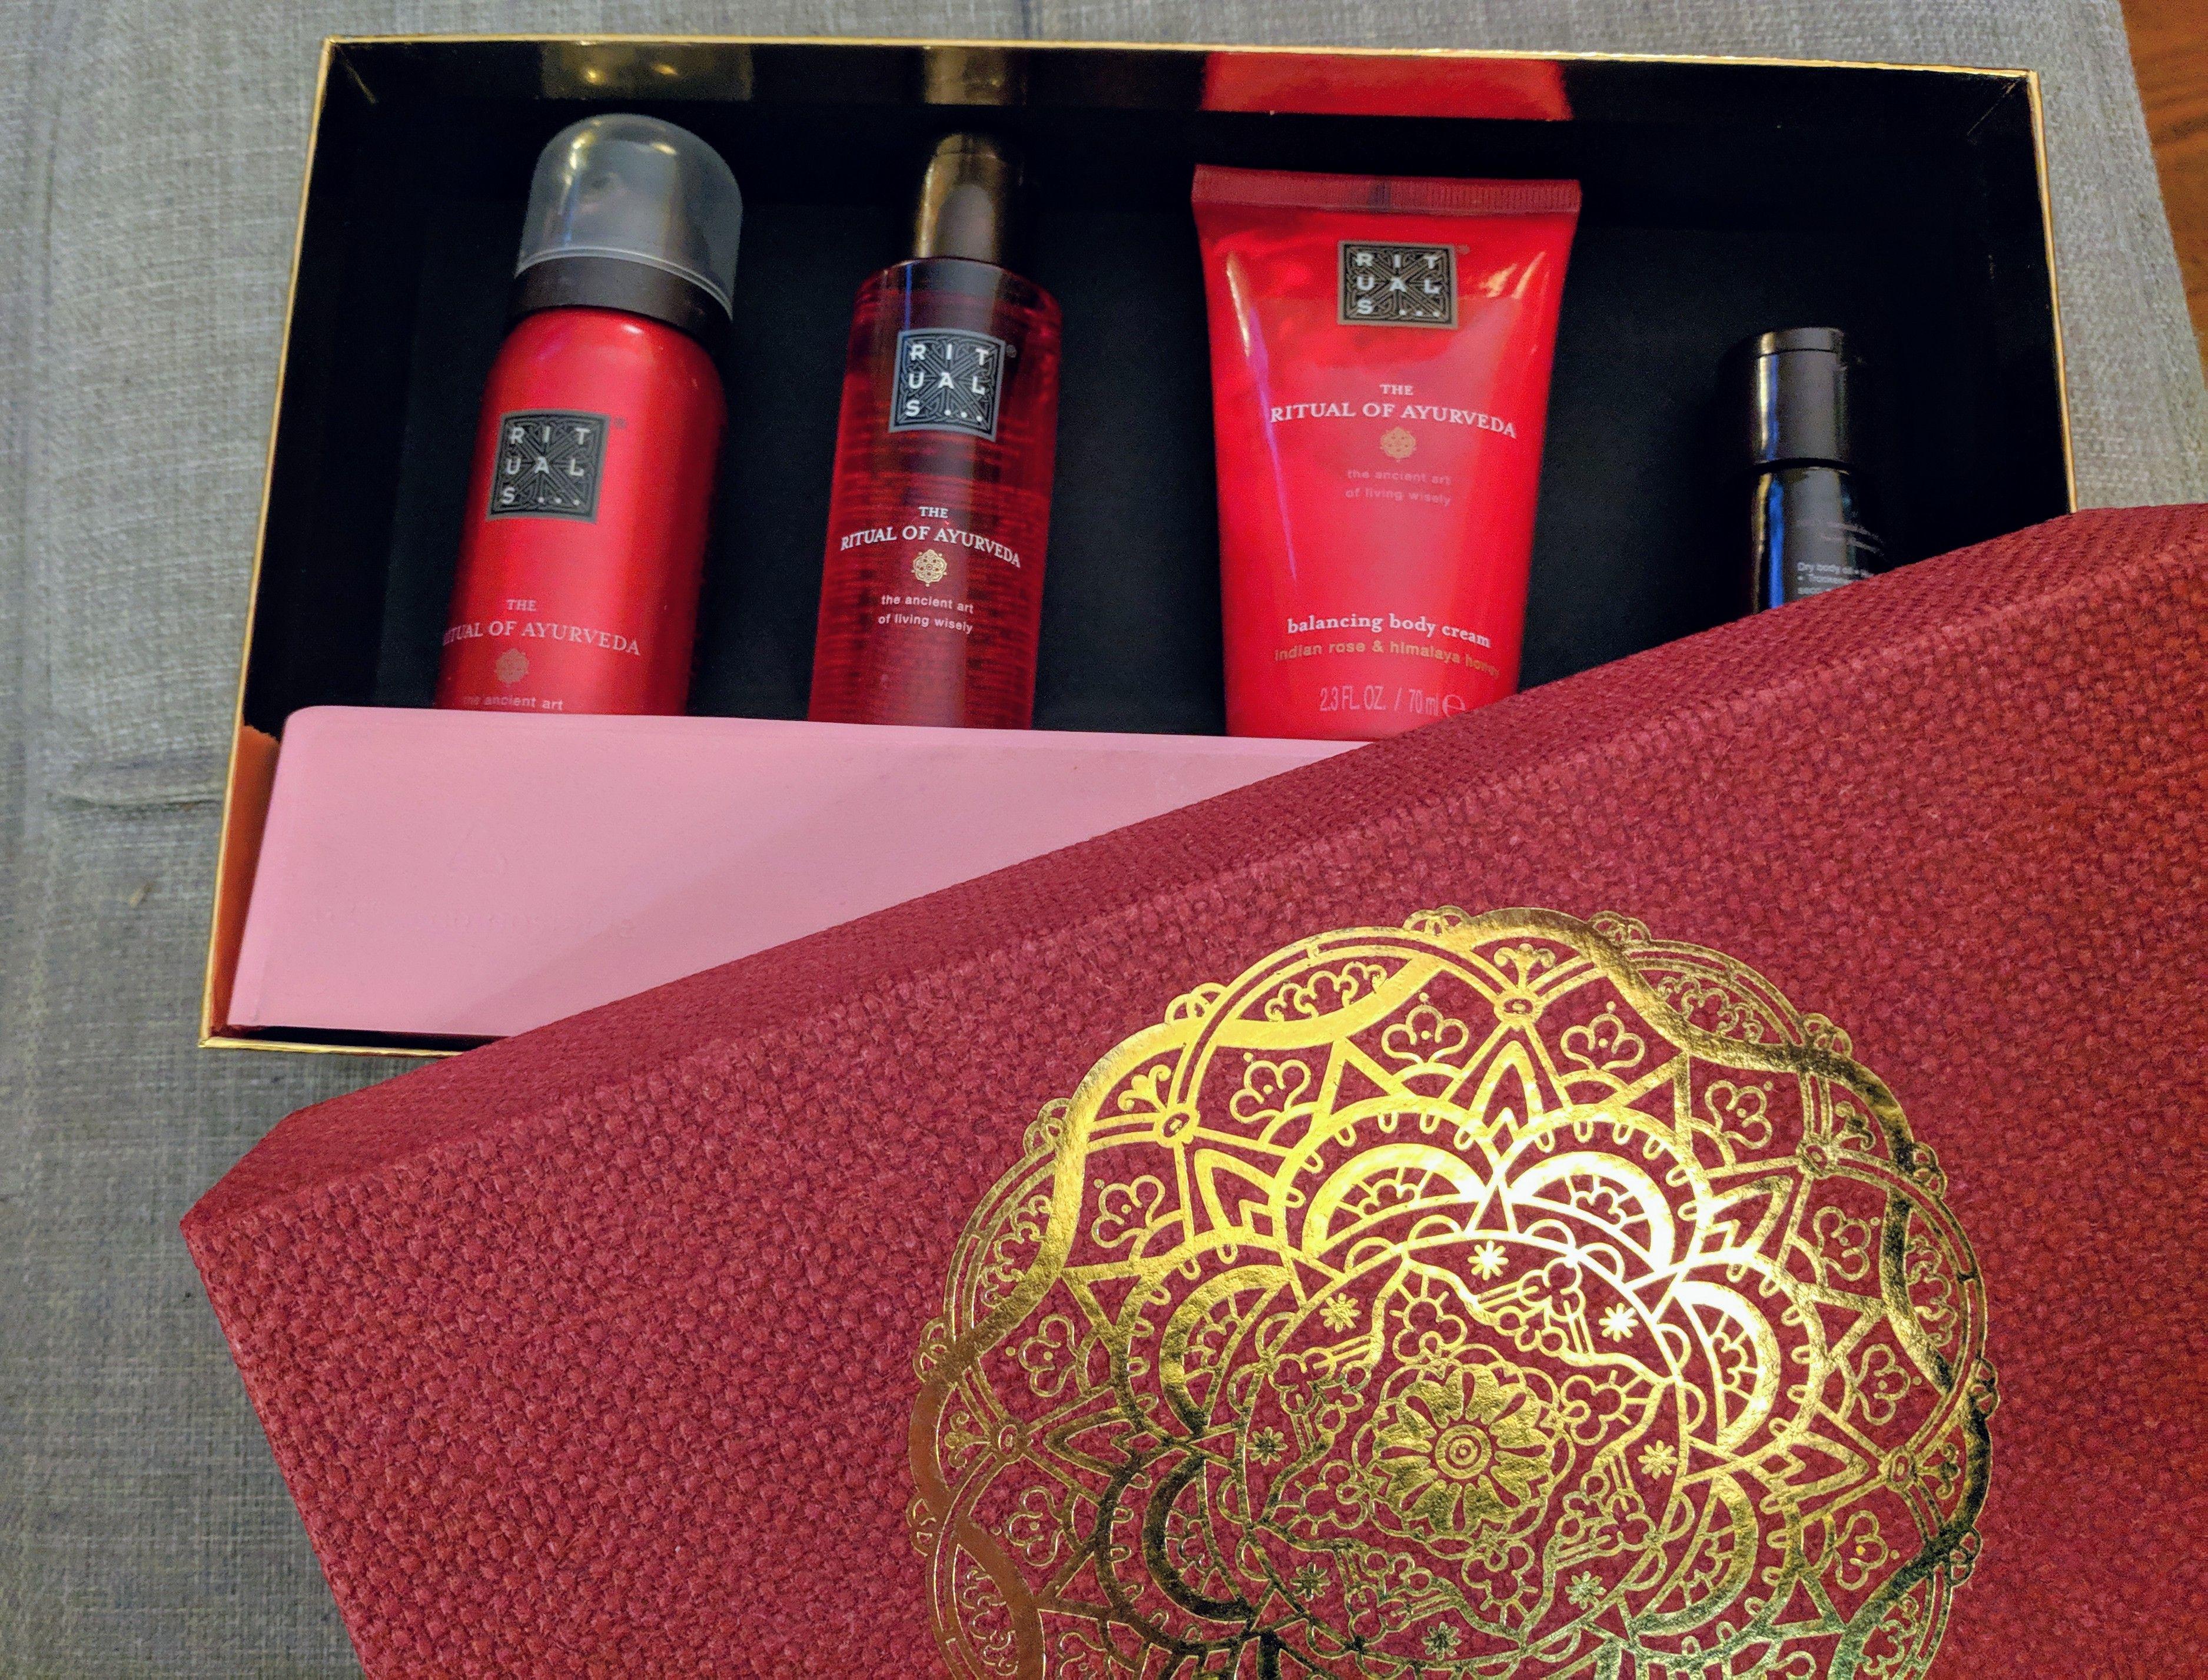 The Ritual Of Ayurveda Balancing Treat Treat Gift Fragrance Gift Set Gift Set